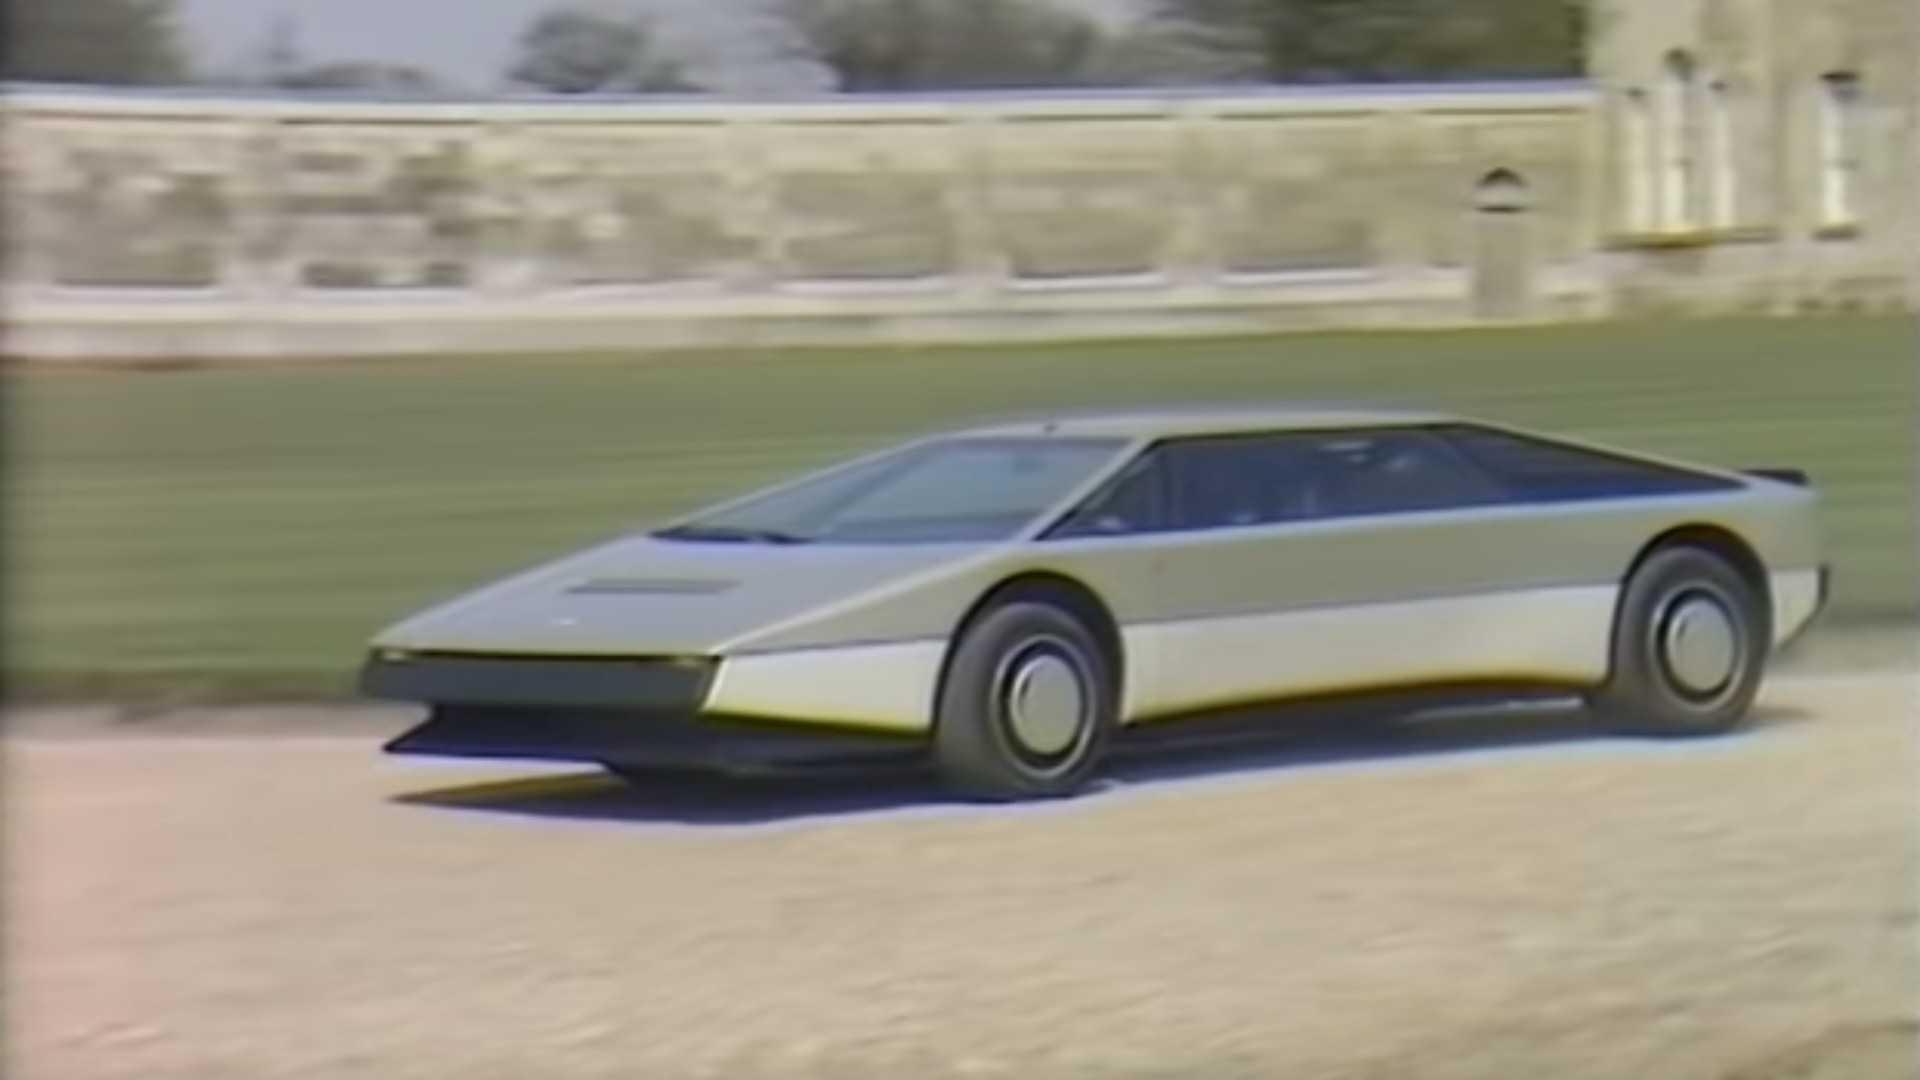 Original Aston Martin Bulldog Review Footage Surfaces Online